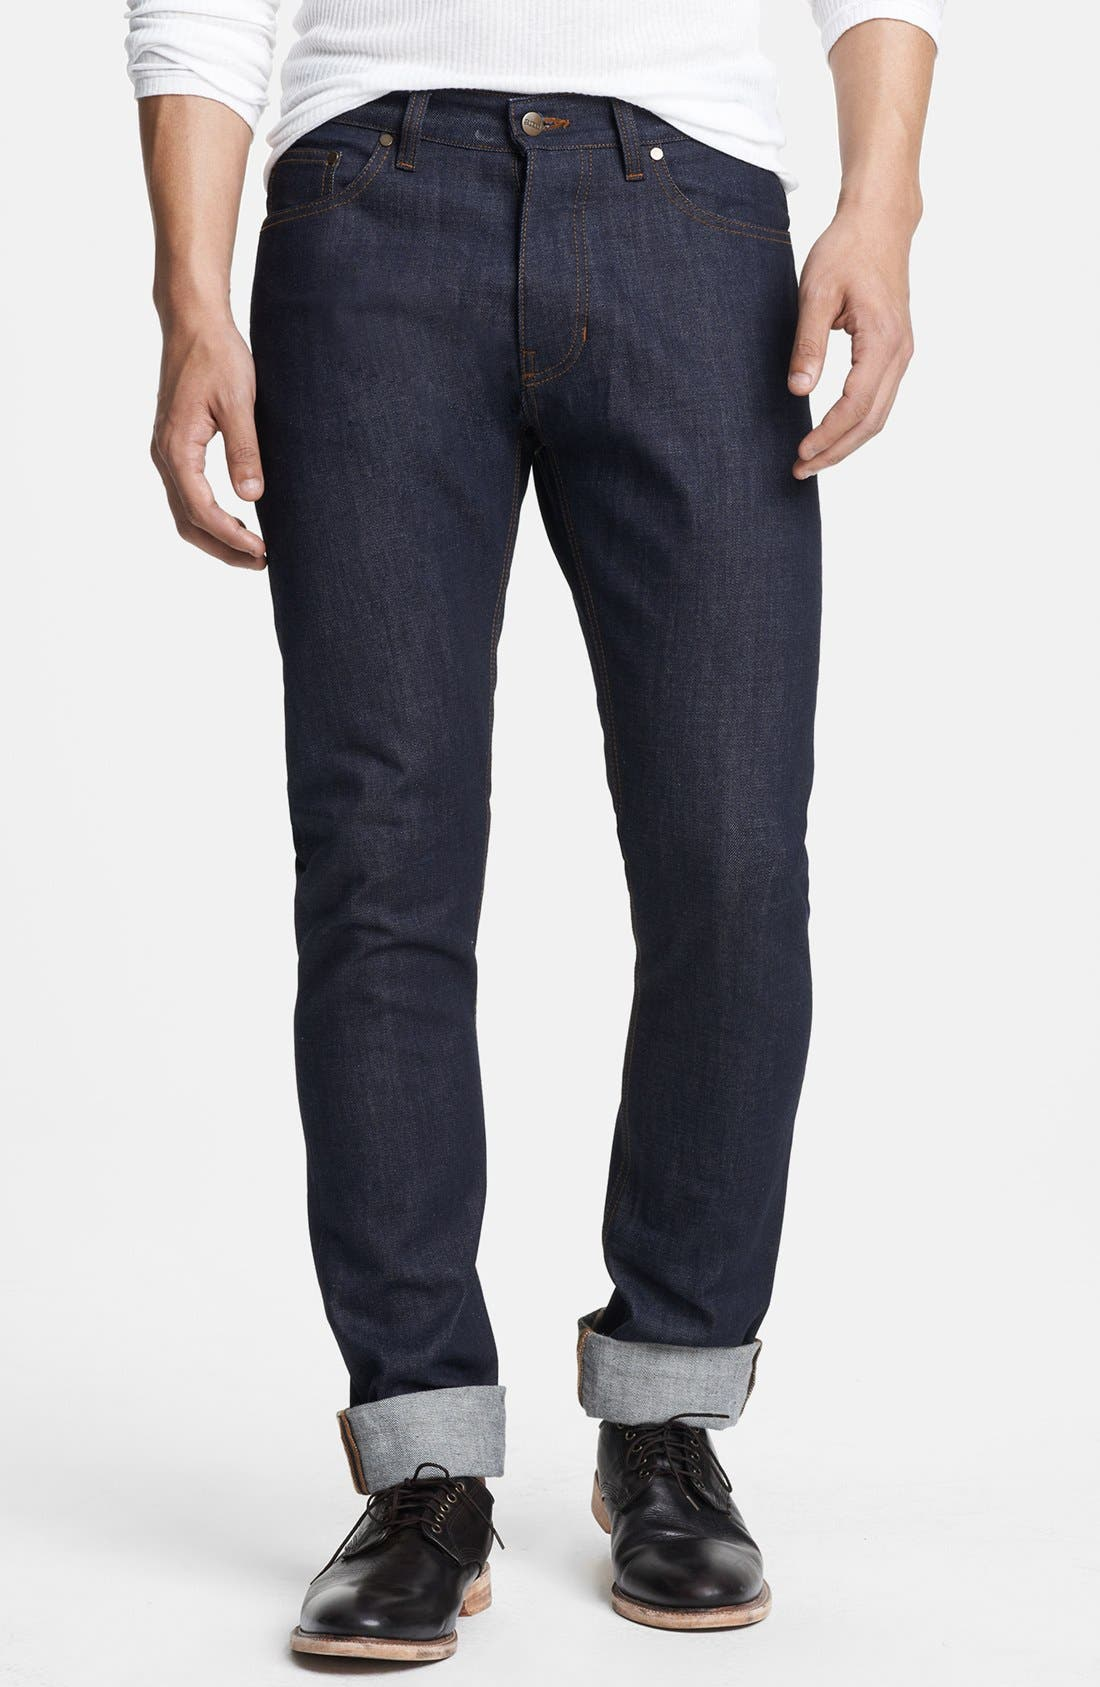 Main Image - AMI Alexandre Mattiussi Straight Leg Raw Selvedge Jeans with Floral Cuff Trim (Indigo)